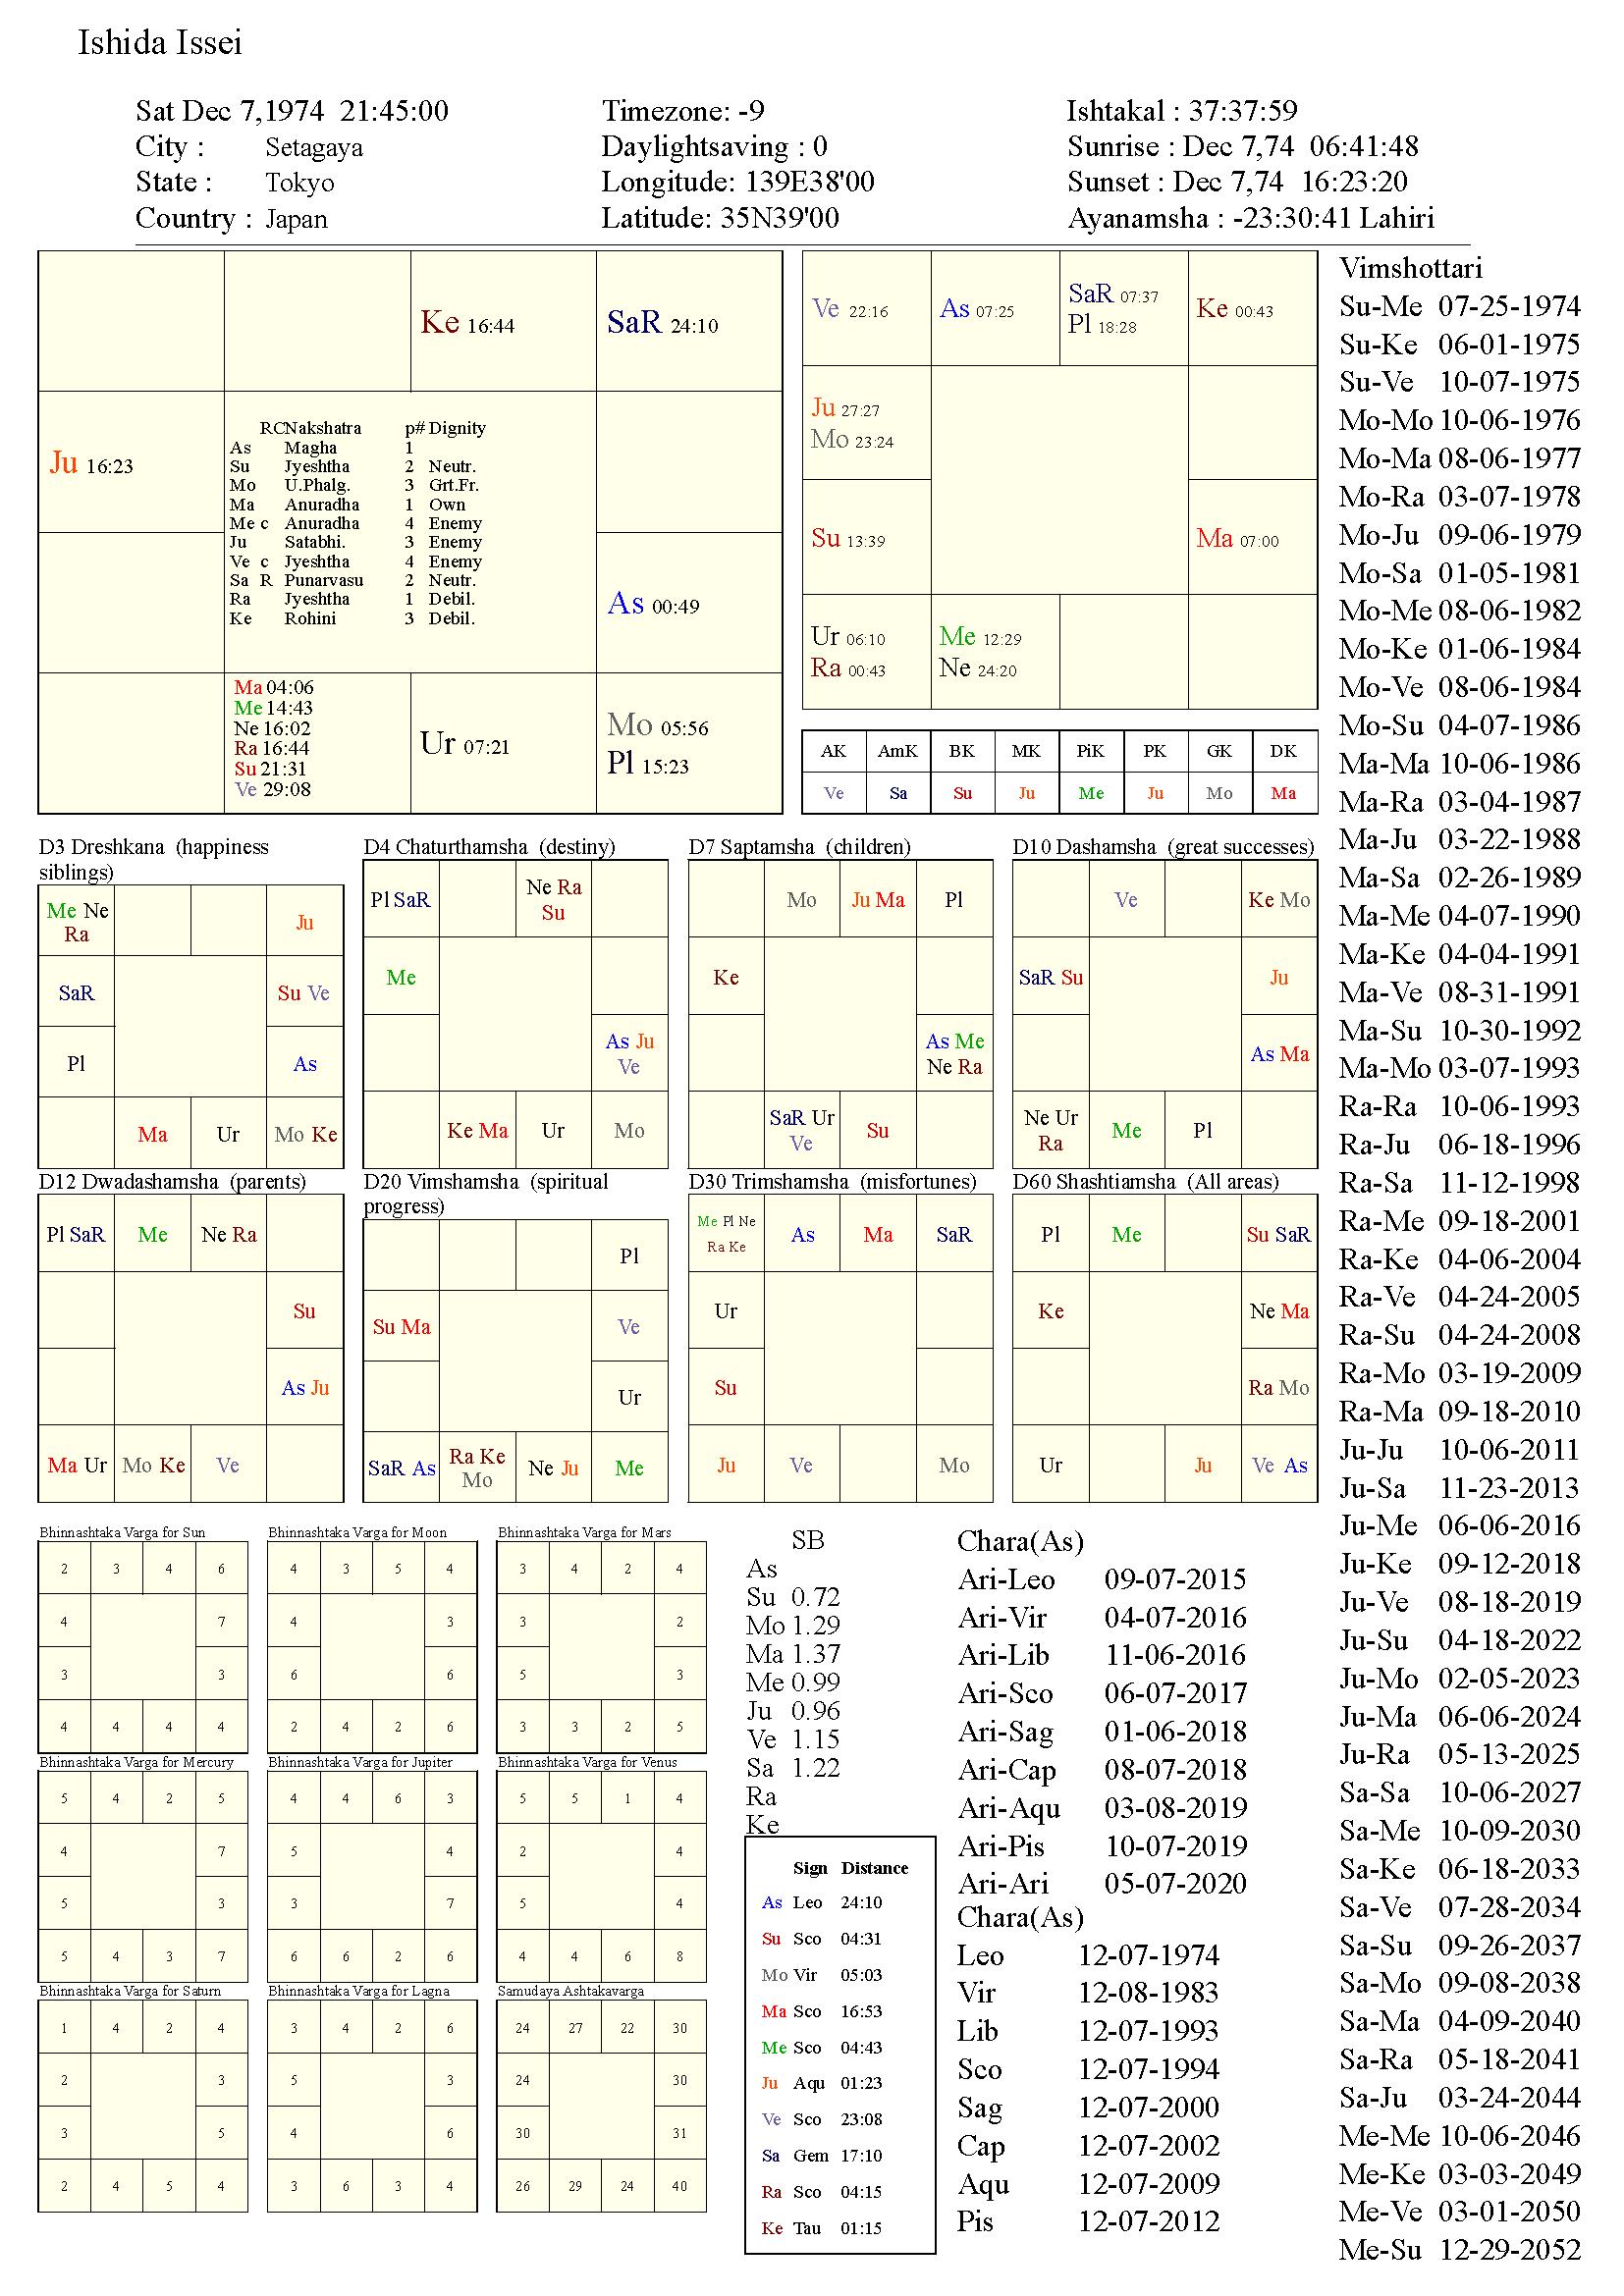 ishidaissei_chart